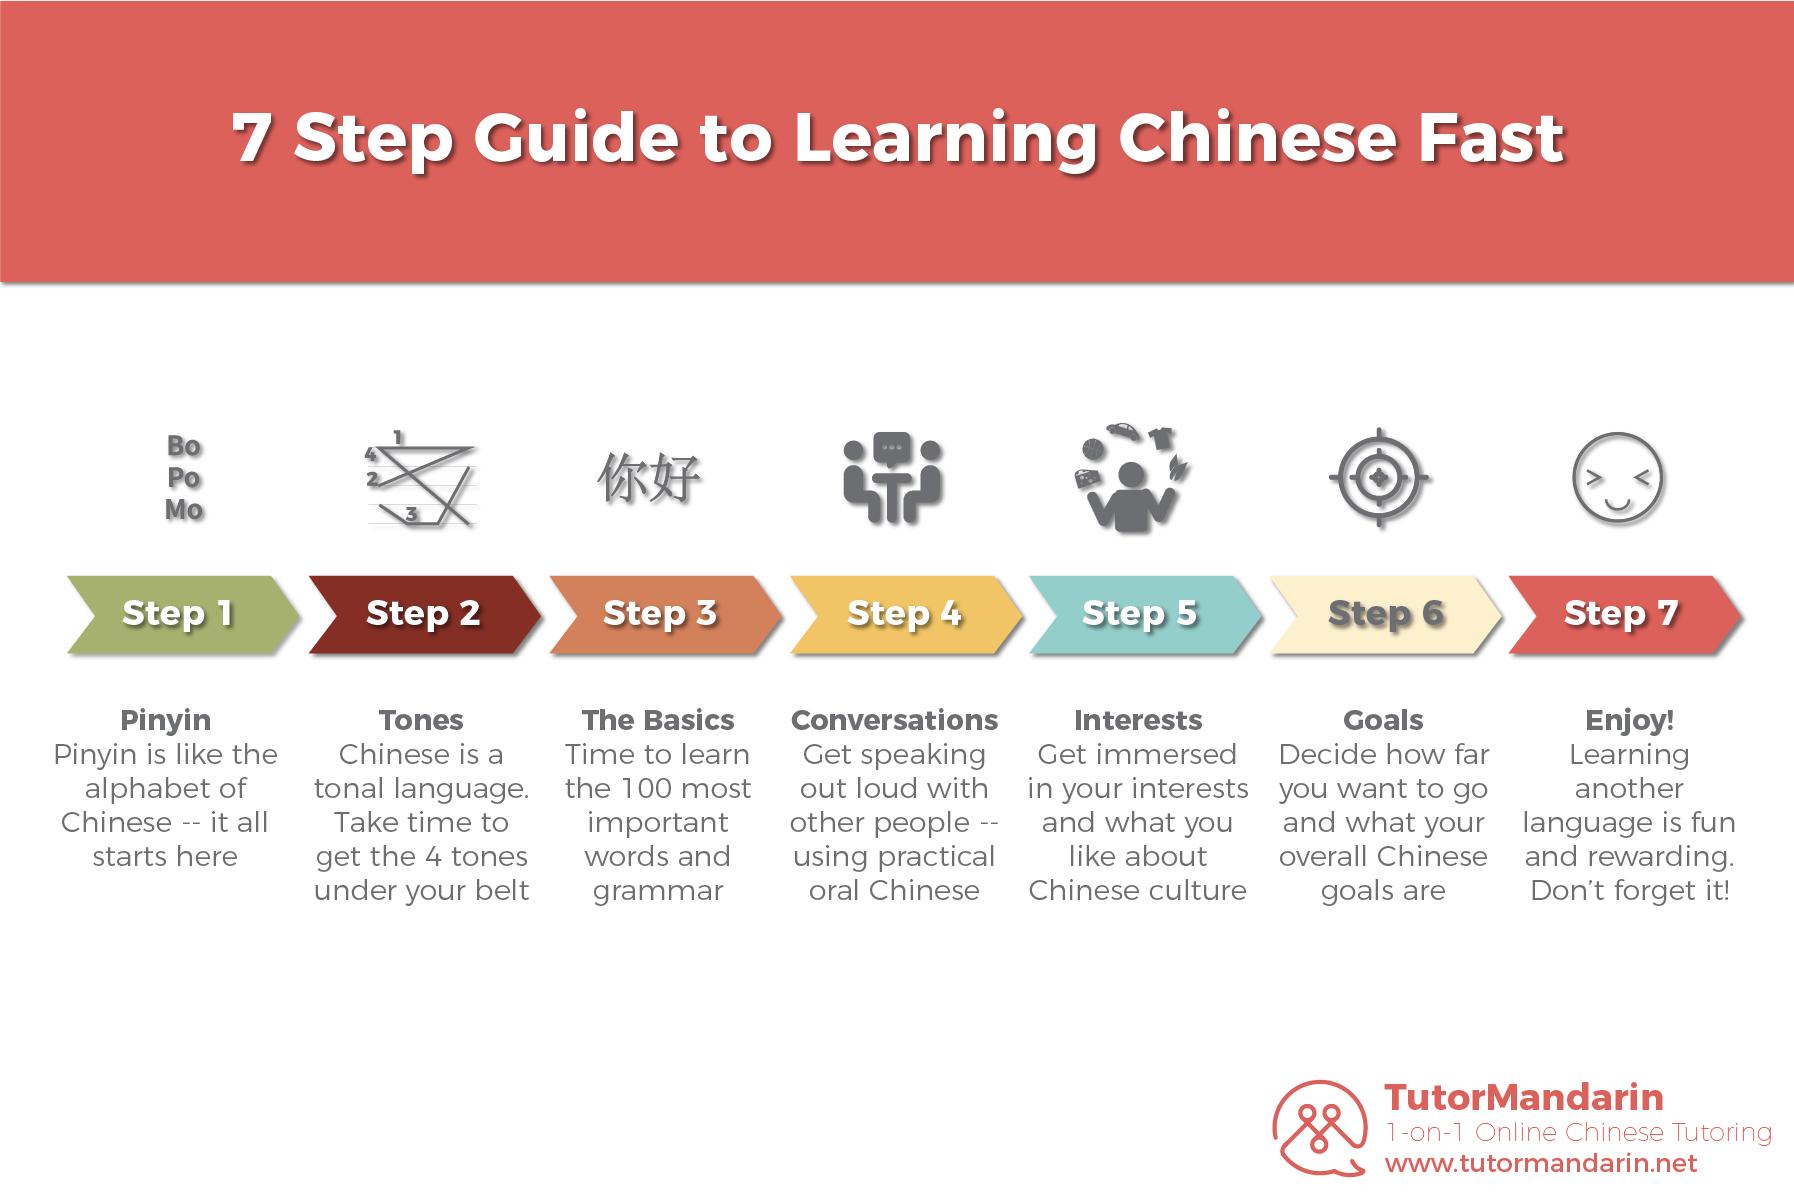 Learn Chinese Online | TutorMandarin: Online Mandarin Tutor